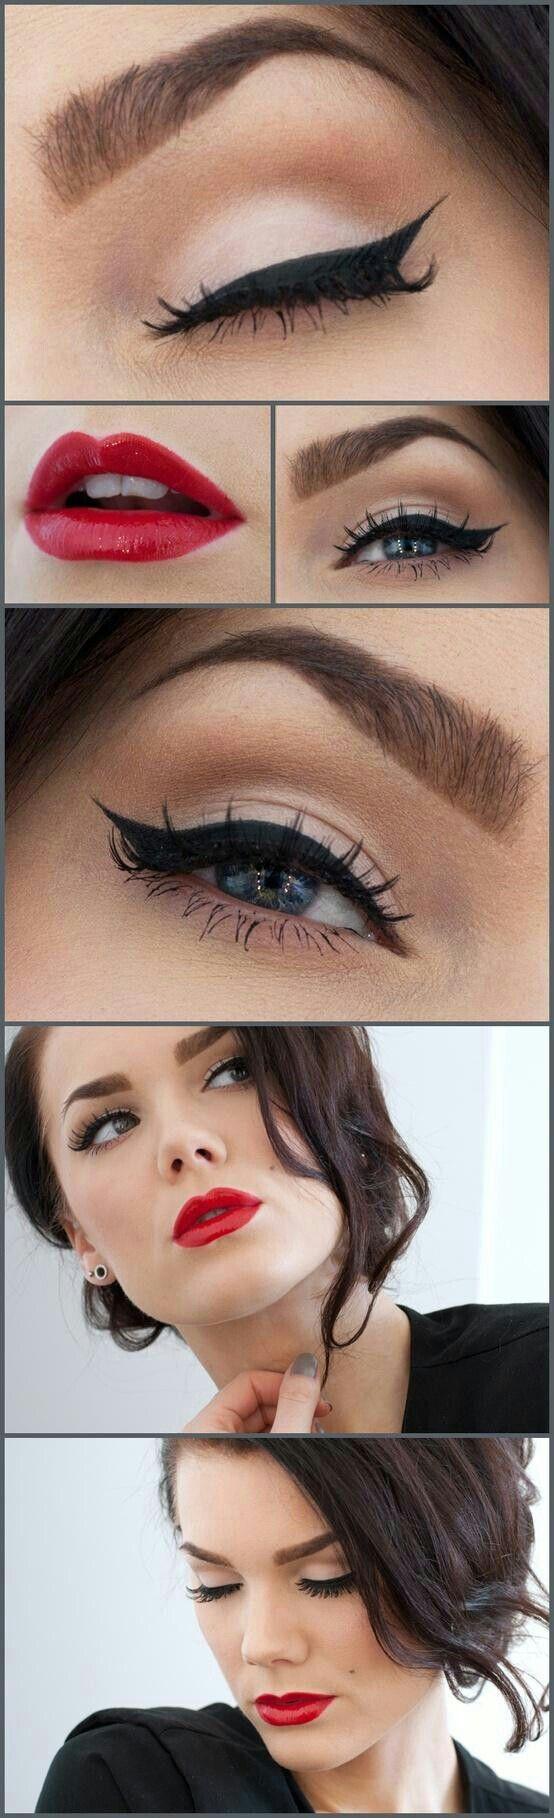 classic makeup. Get a 10% discount at Sephora: http://www.trendslove.com/deals/Sephora-Coupons--amp--Discounts--/